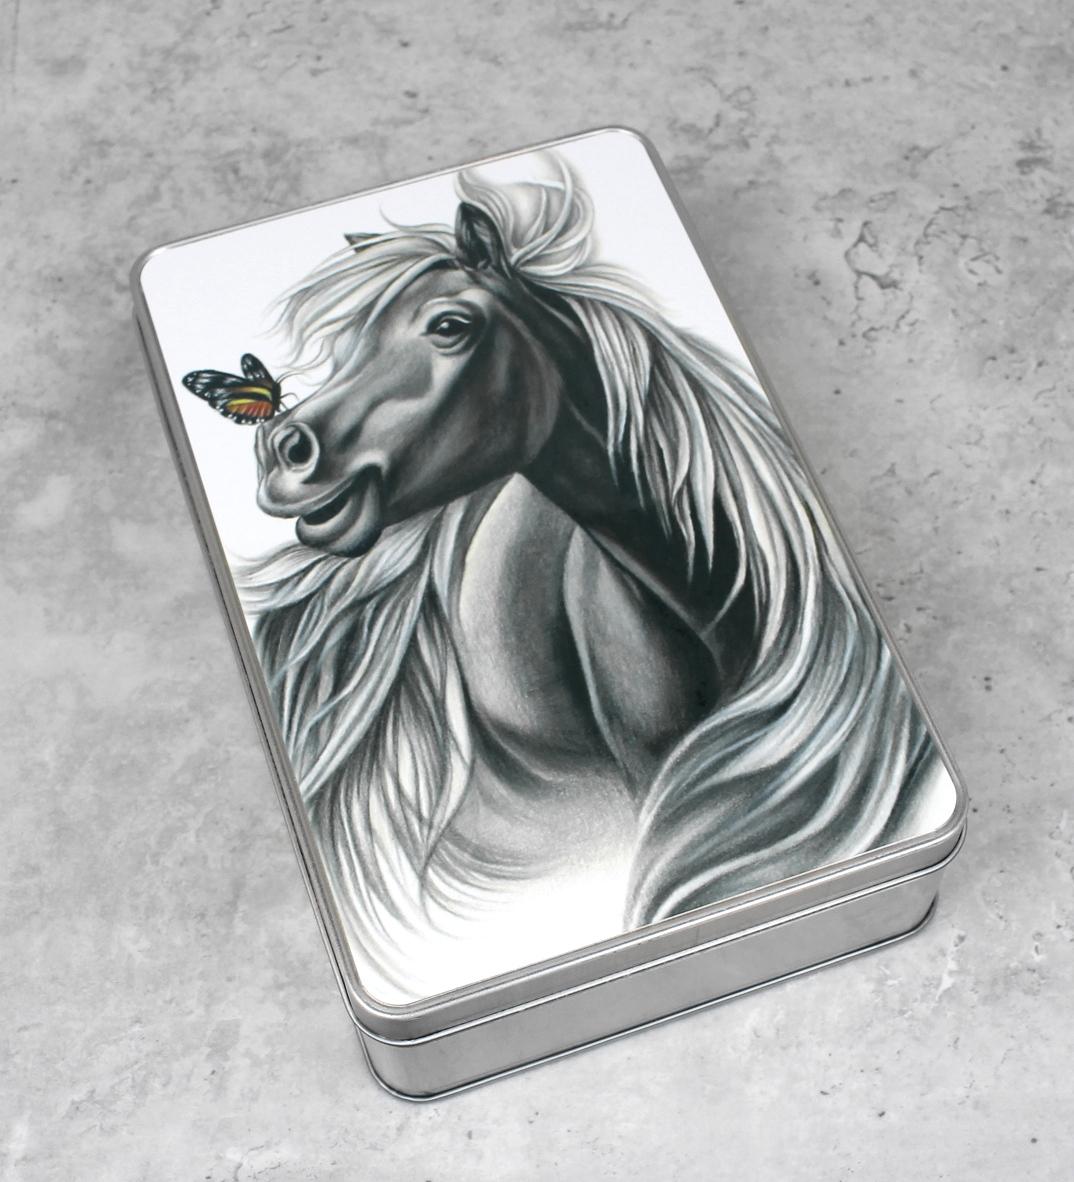 Hevonen ja perhonen -Peltirasia